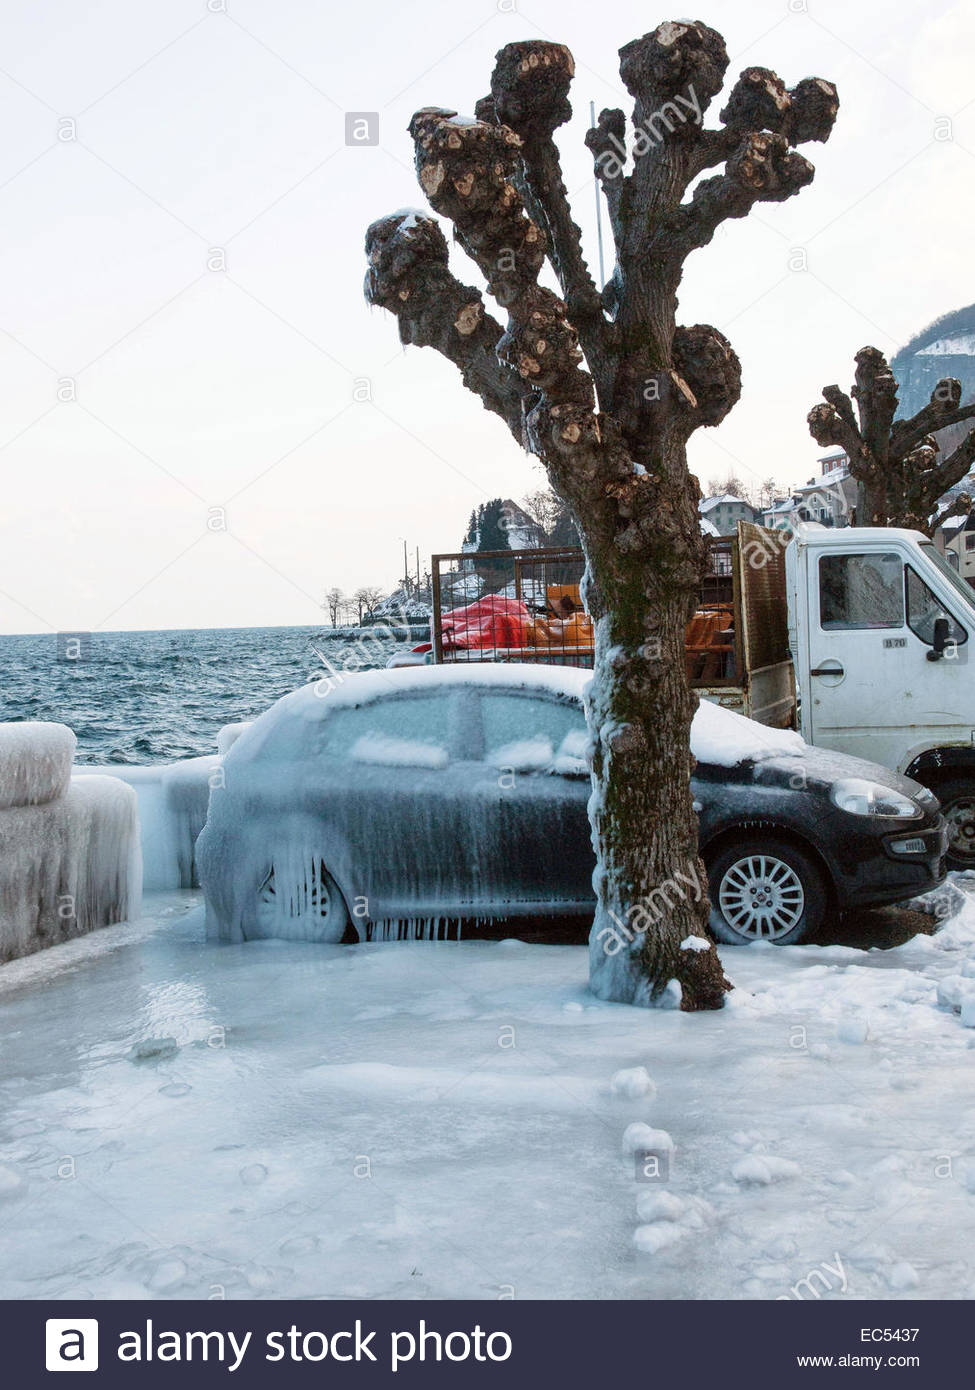 Haute-Savoie, lac Leman (Lake Geneva). Cold wind creating ice landscape, in winter. - Stock Image